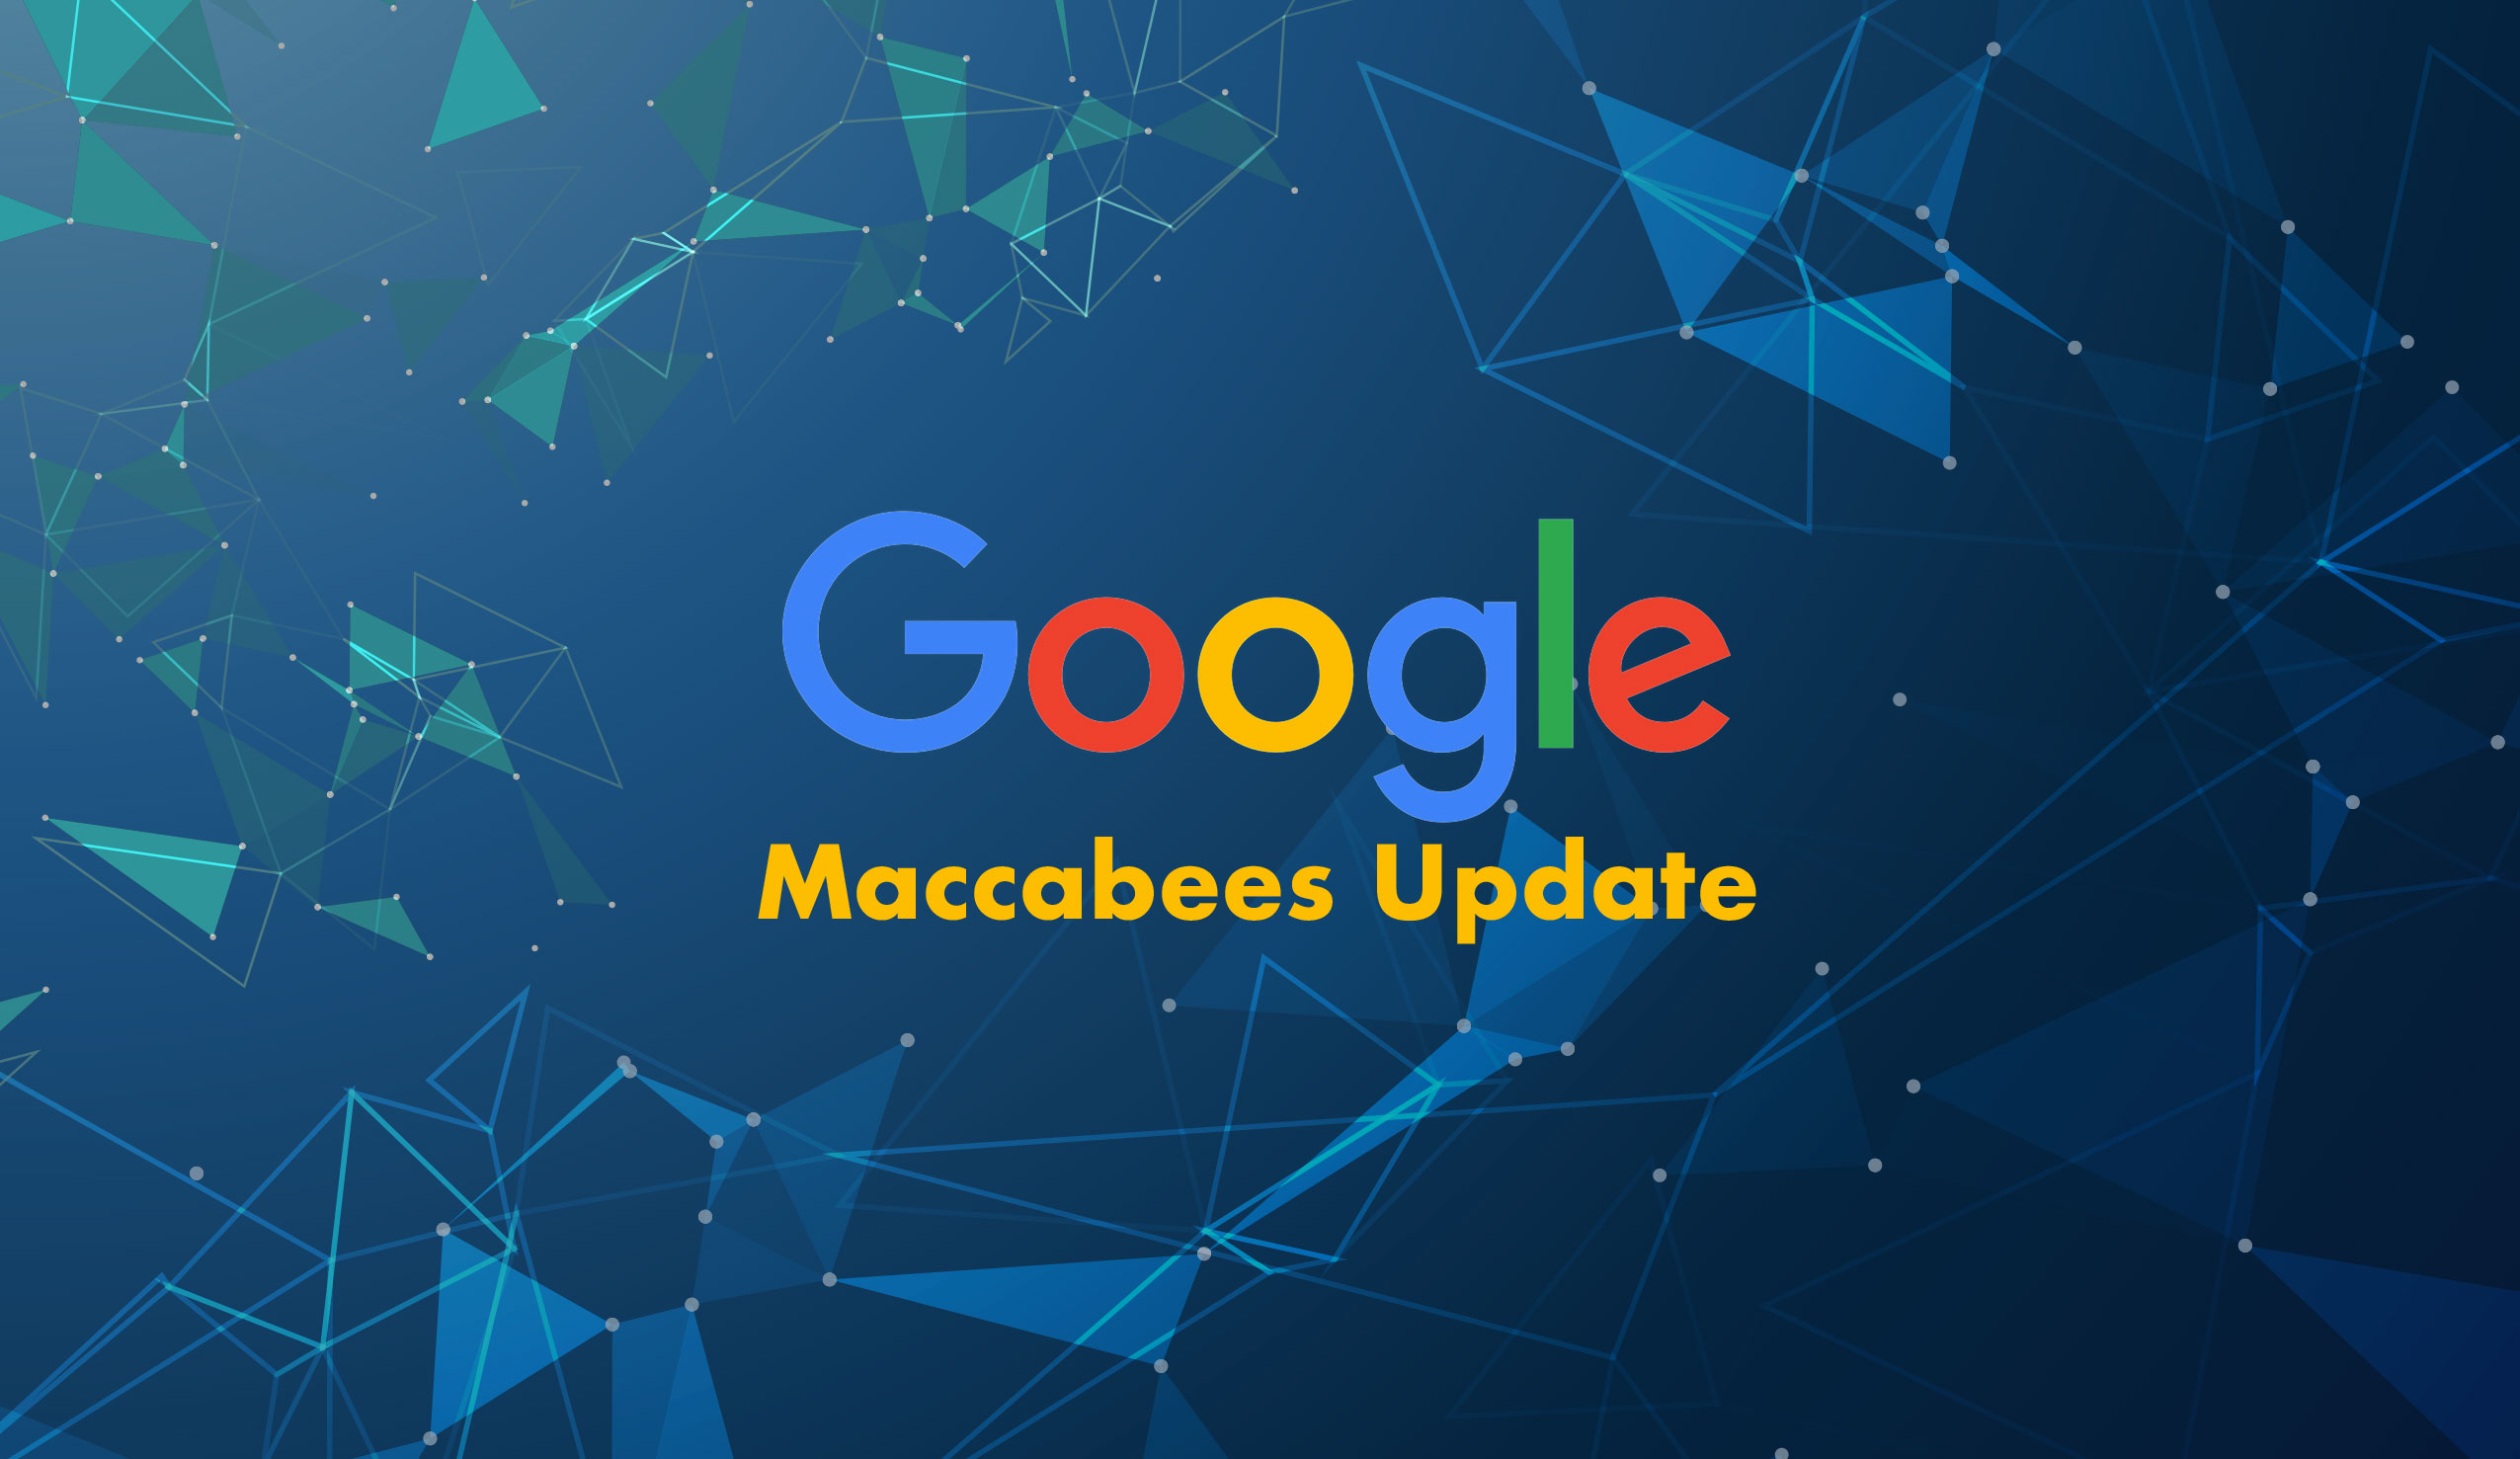 Google Maccabees 03